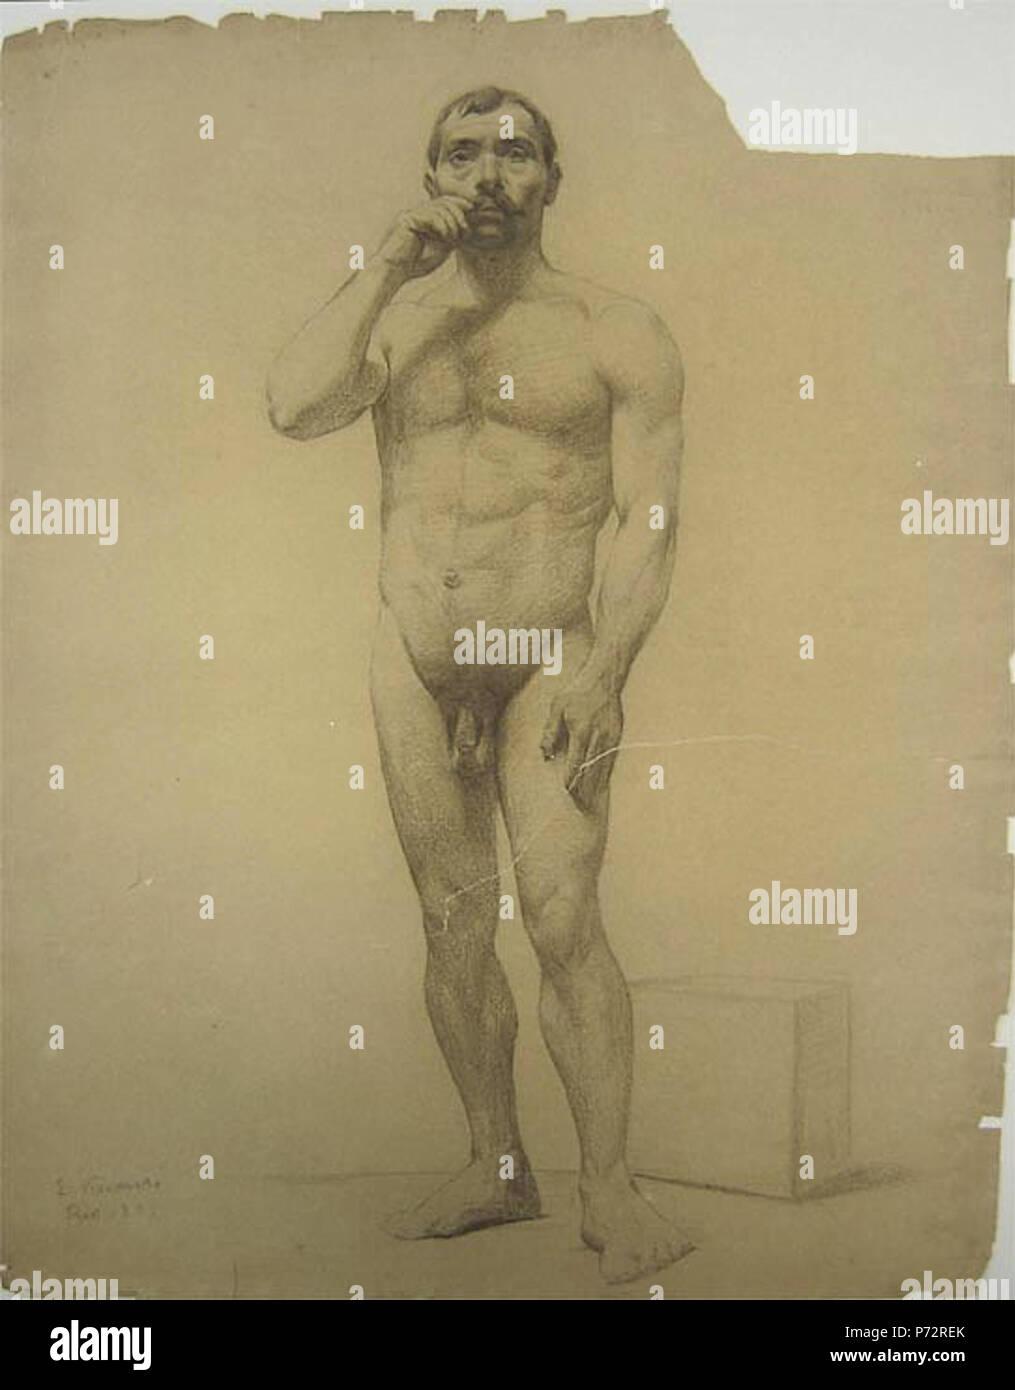 14 Eliseu Visconti - Nu masculino de pé 1889 Imagen De Stock